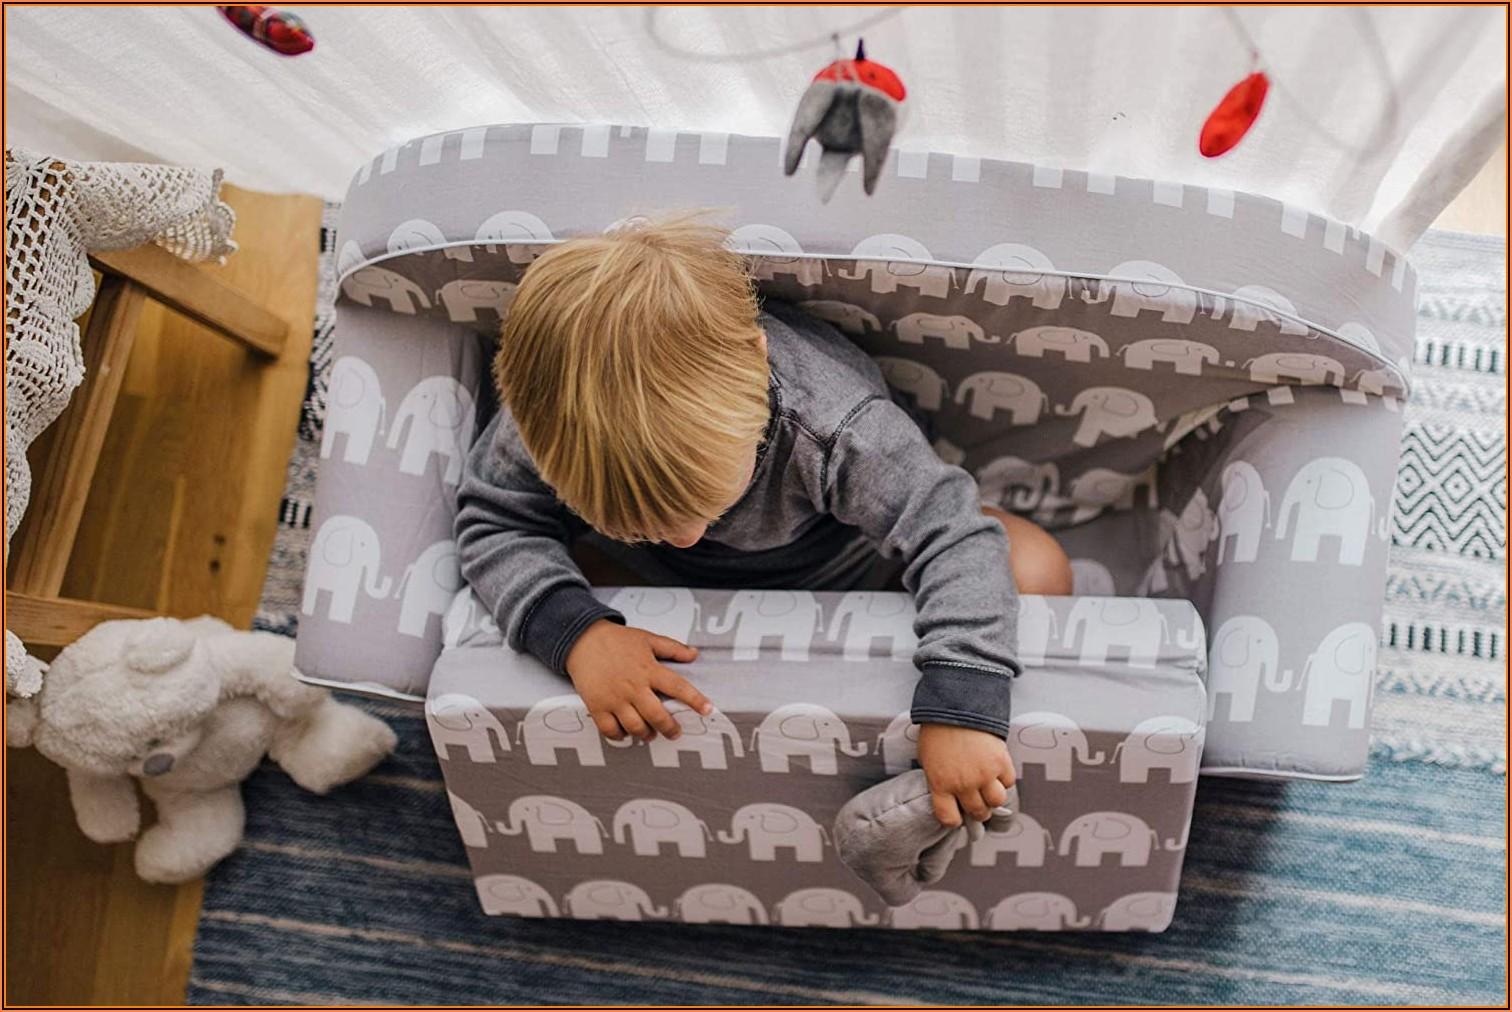 Kinderzimmer 9 Jährige